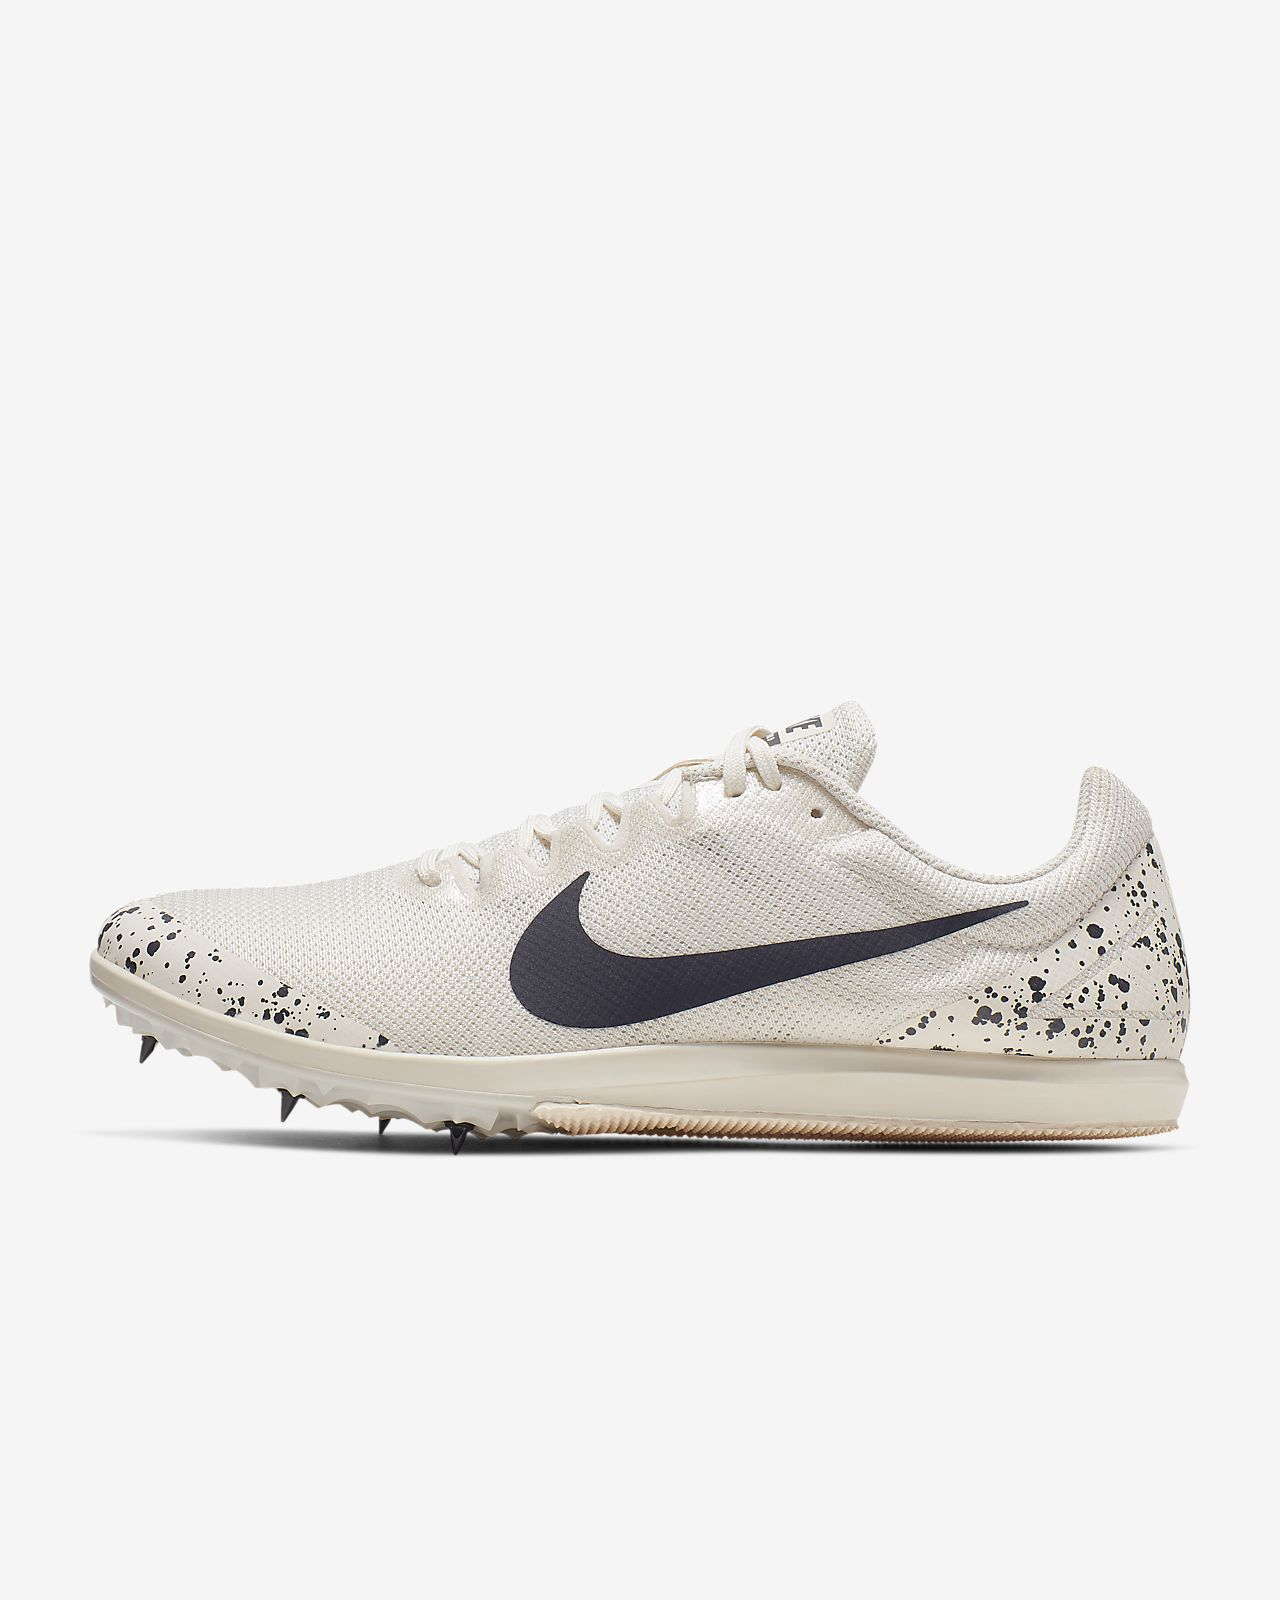 Беговые шиповки унисекс Nike Zoom Rival D 10